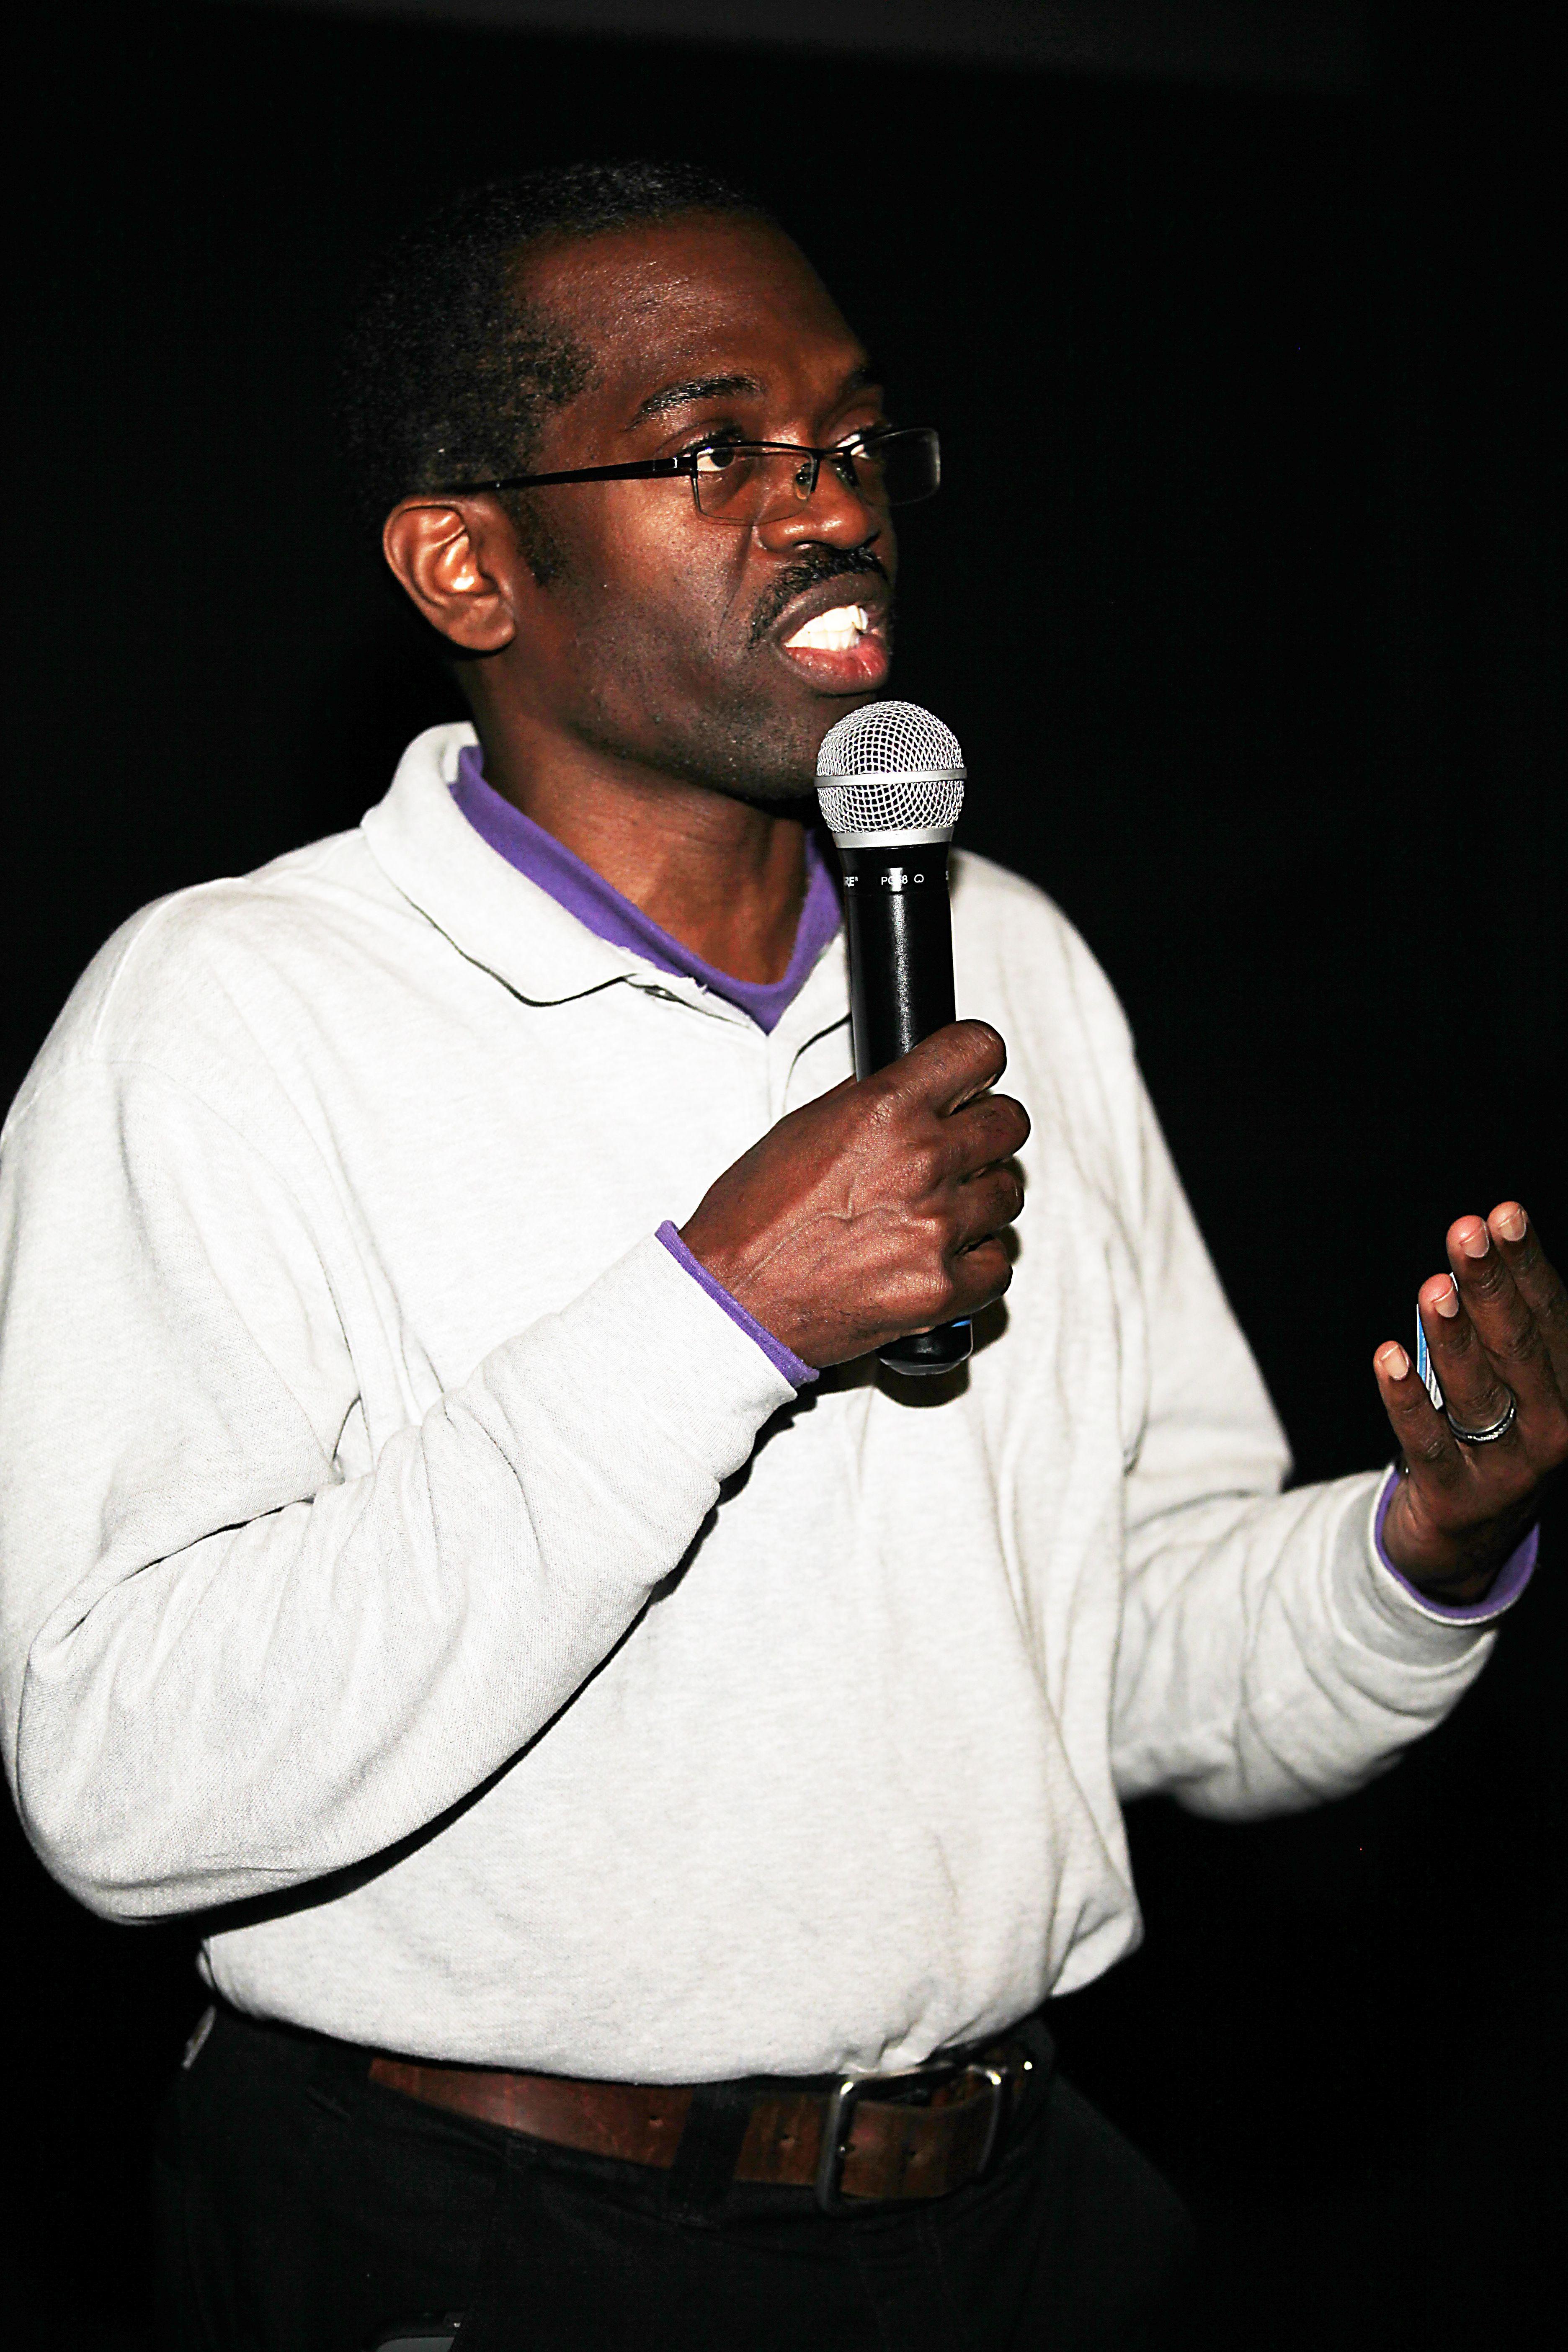 Pin on 2014 Black Heritage Film Series 12 Years a Slave